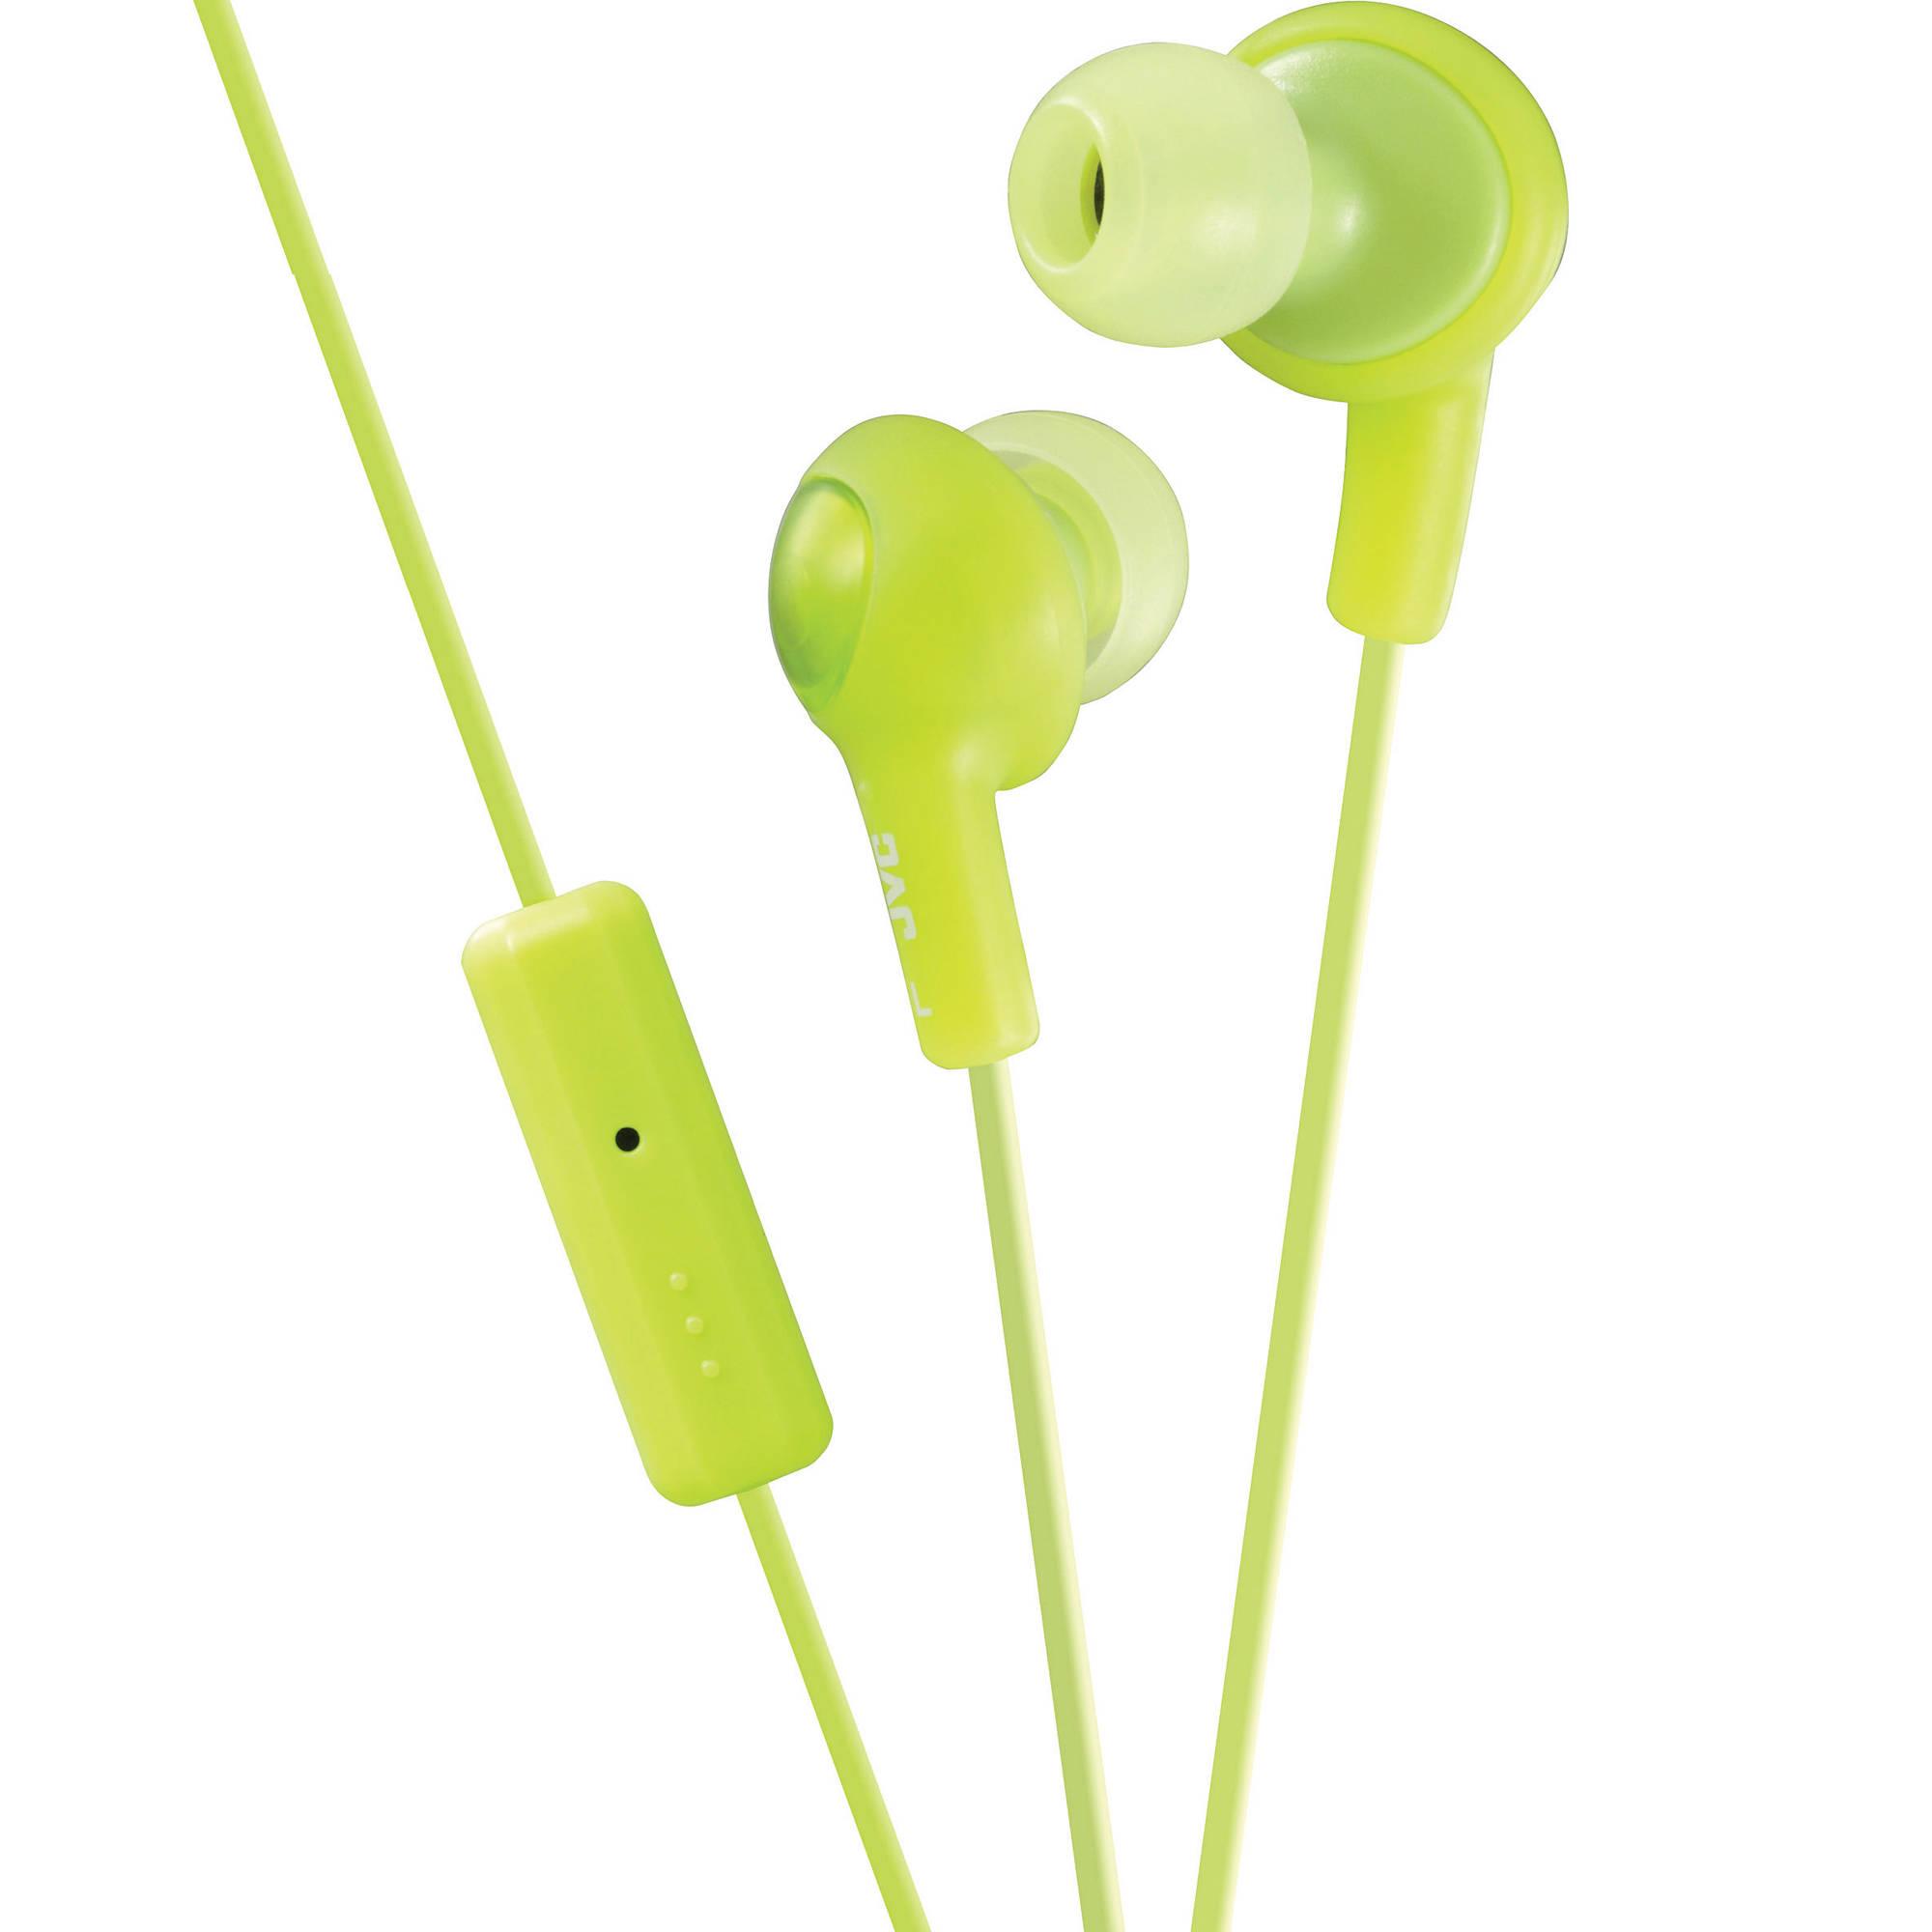 JVC HA-FR6 Gumy Plus Earbuds (Green) HA-FR6G B H Photo Video 70c4008be7